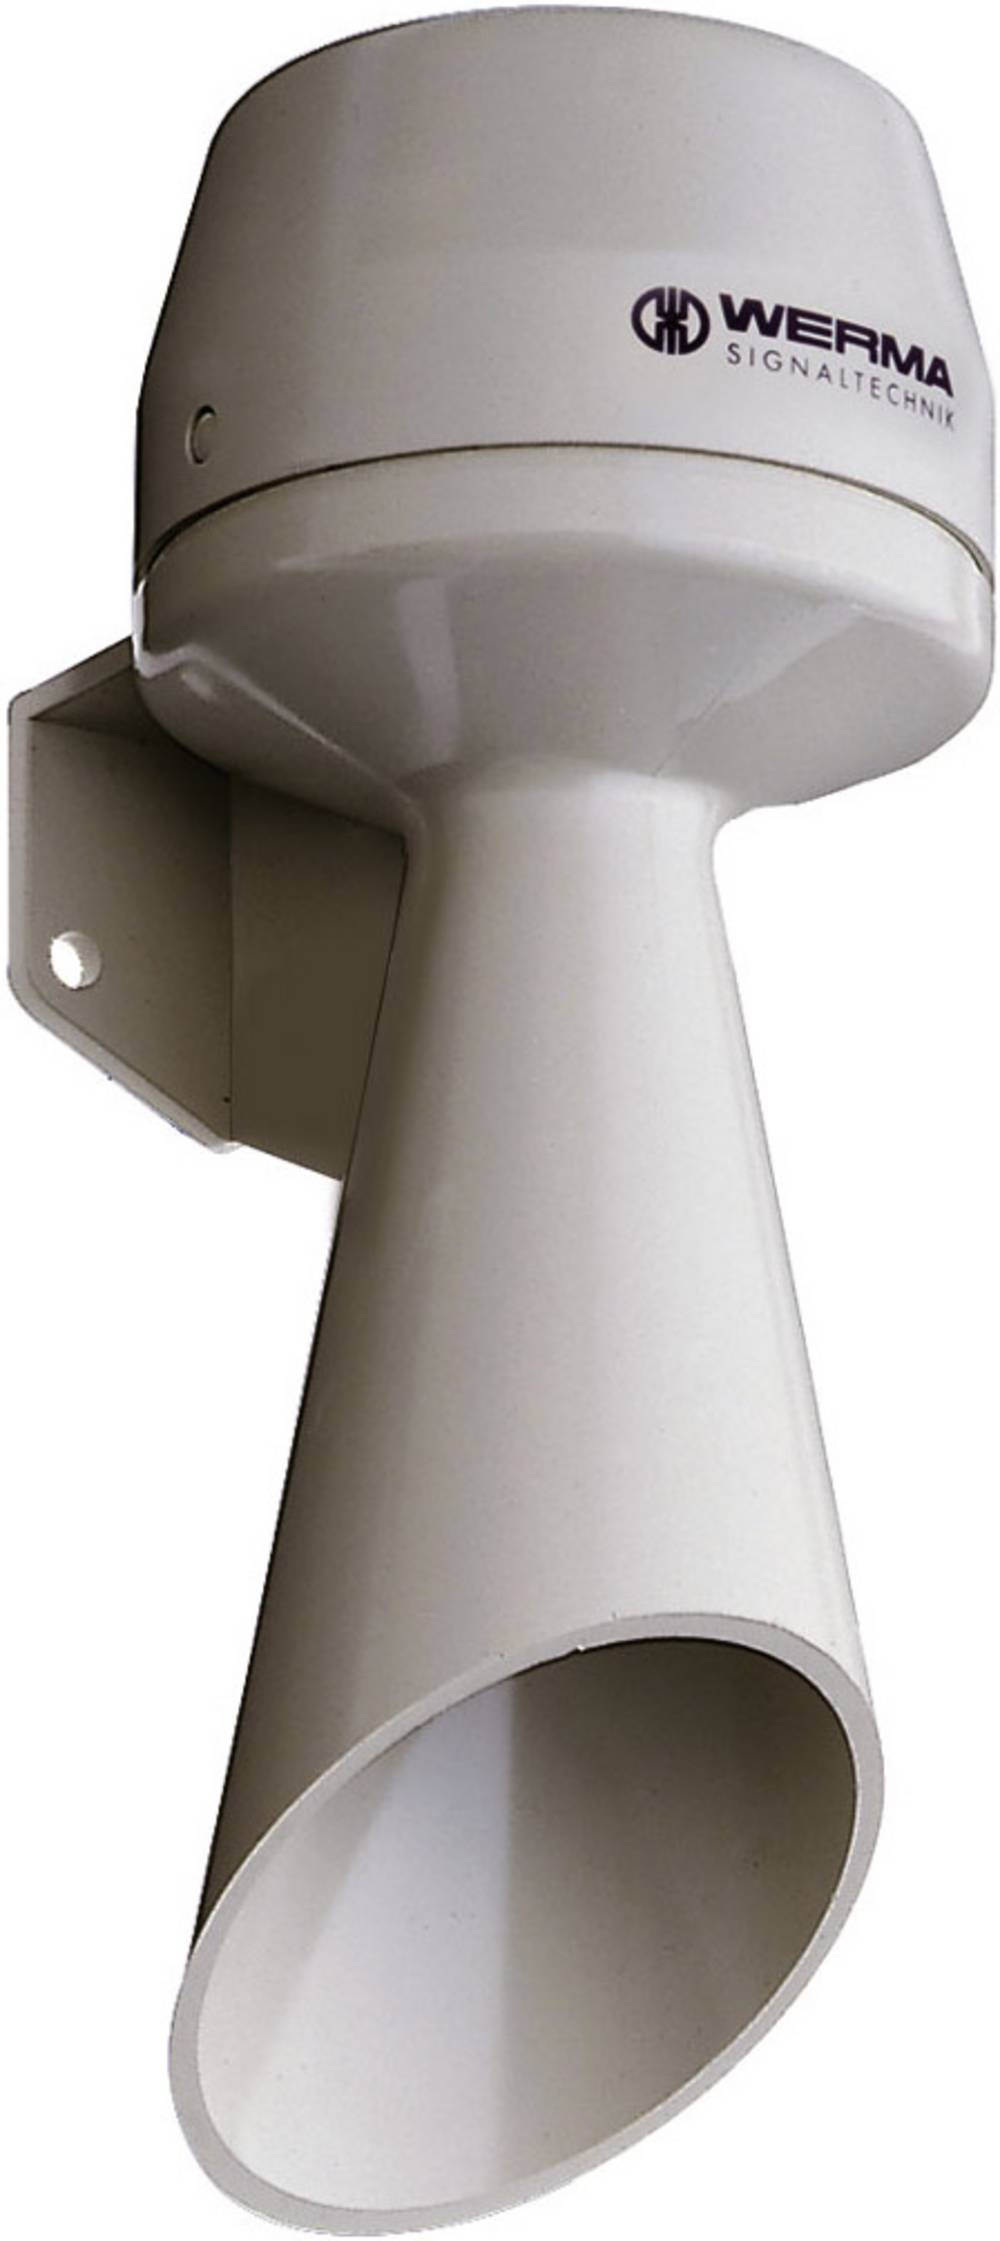 SIGNALNA HUPA WM 24 V/DC 70 X170 mm Werma Signaltechnik 582.052.55